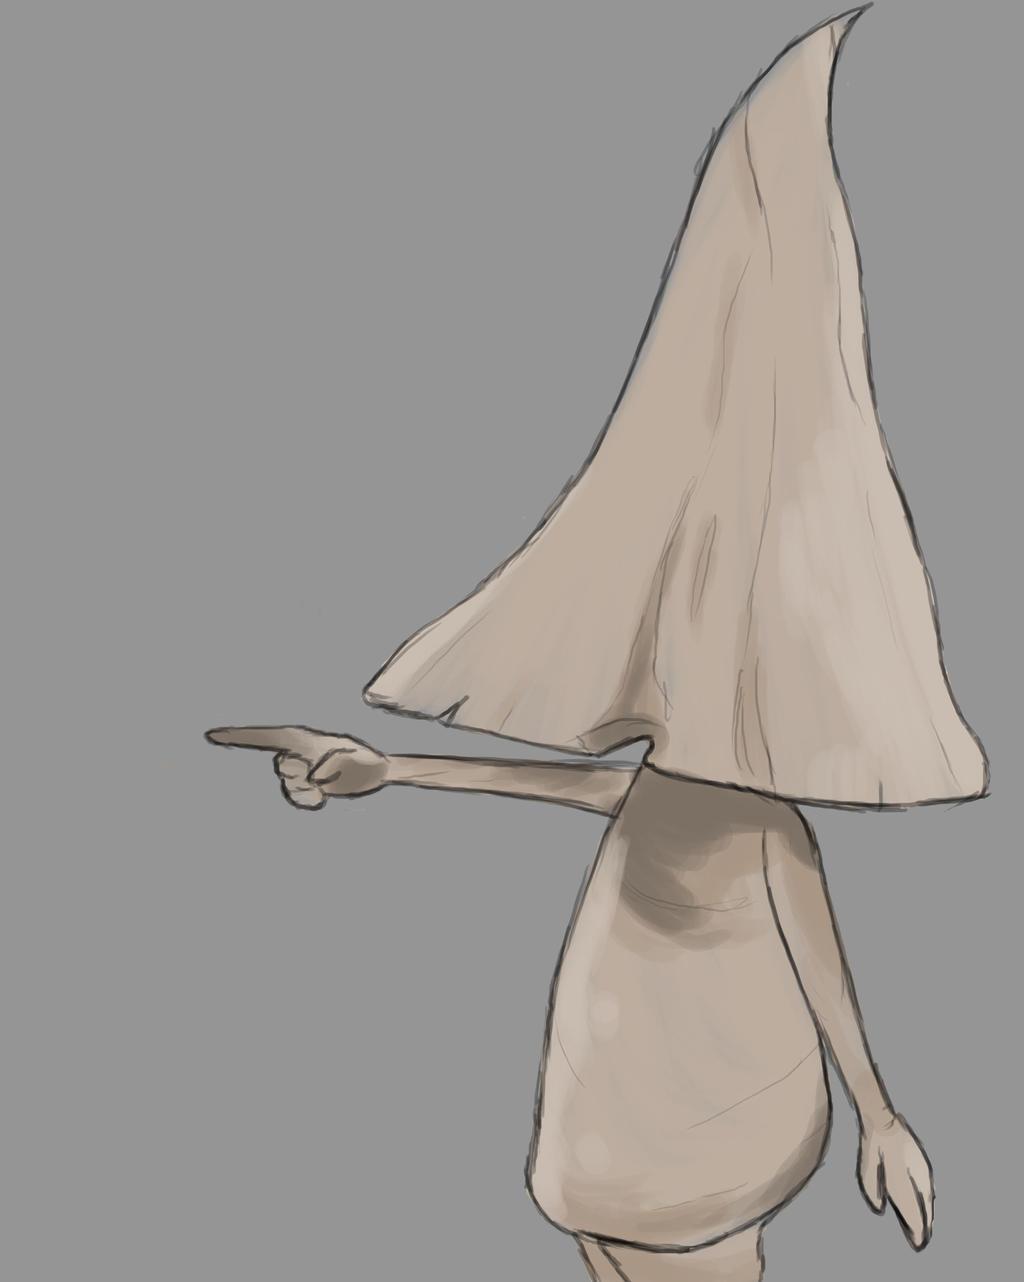 Gnome Daily sketch #846 by GothicVampireFreak